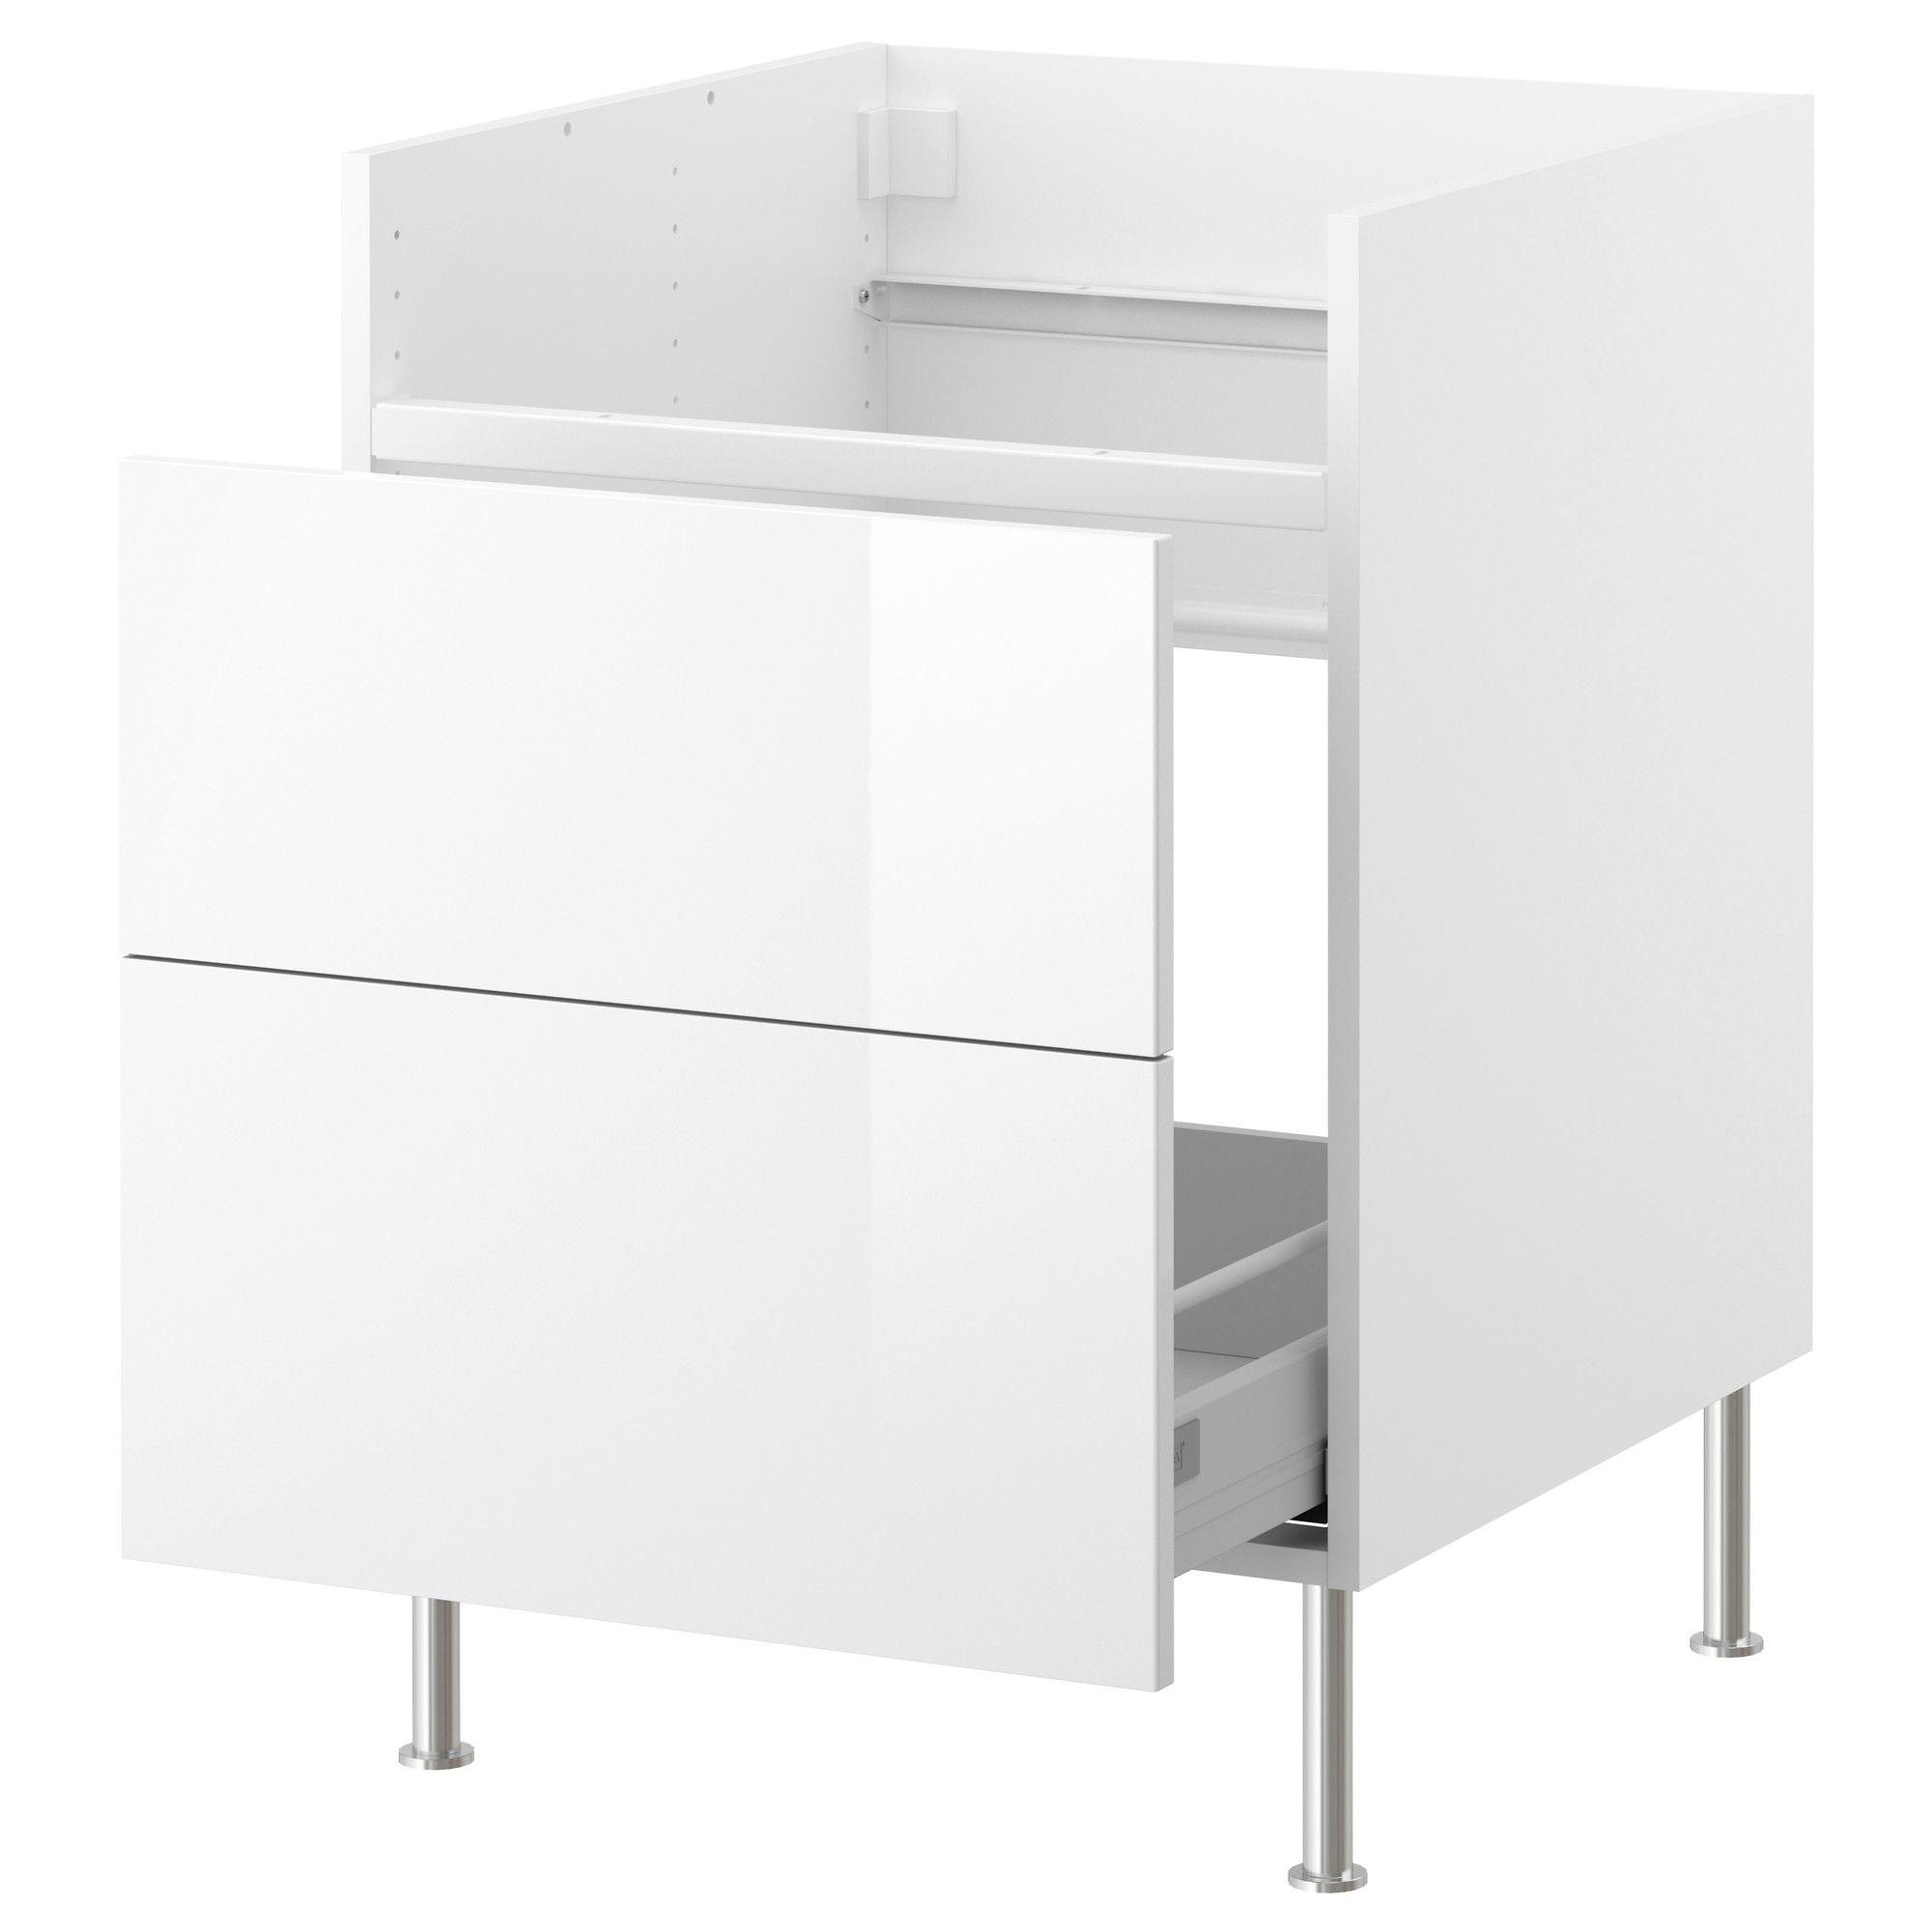 FAKTUM DOMSJÖ星盆用地櫃連1個抽屜 - Abstrakt 白色, 60 厘米 - IKEA ...